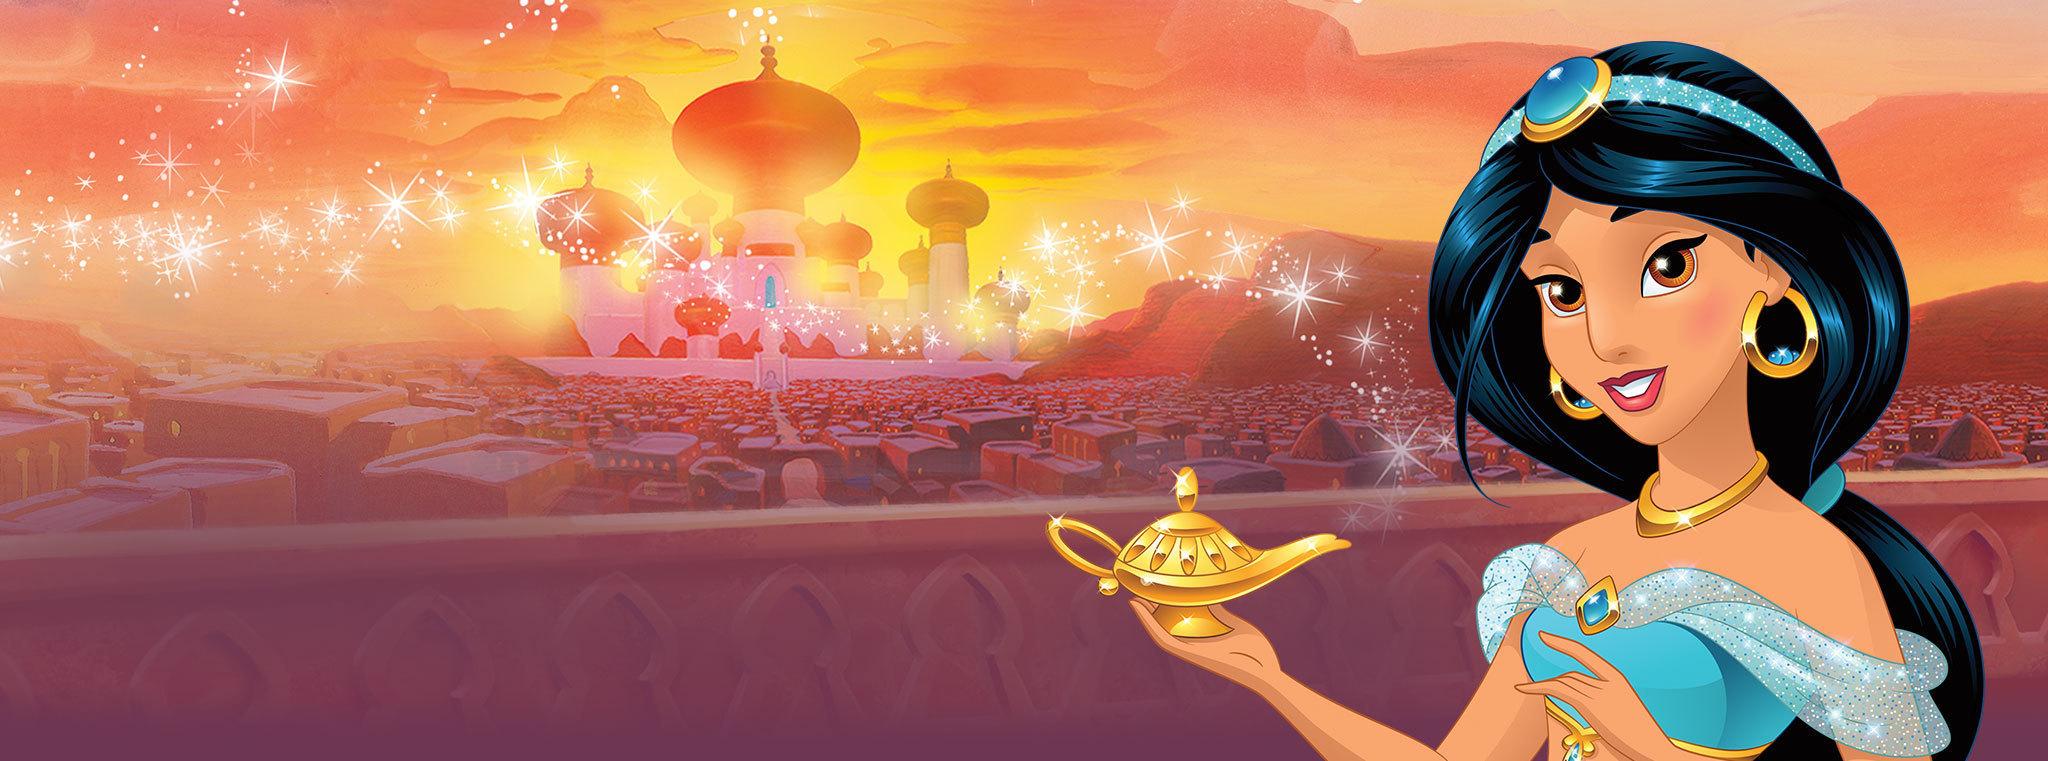 Disney Princess Supercute Plushes Wave 2 Coming Soon